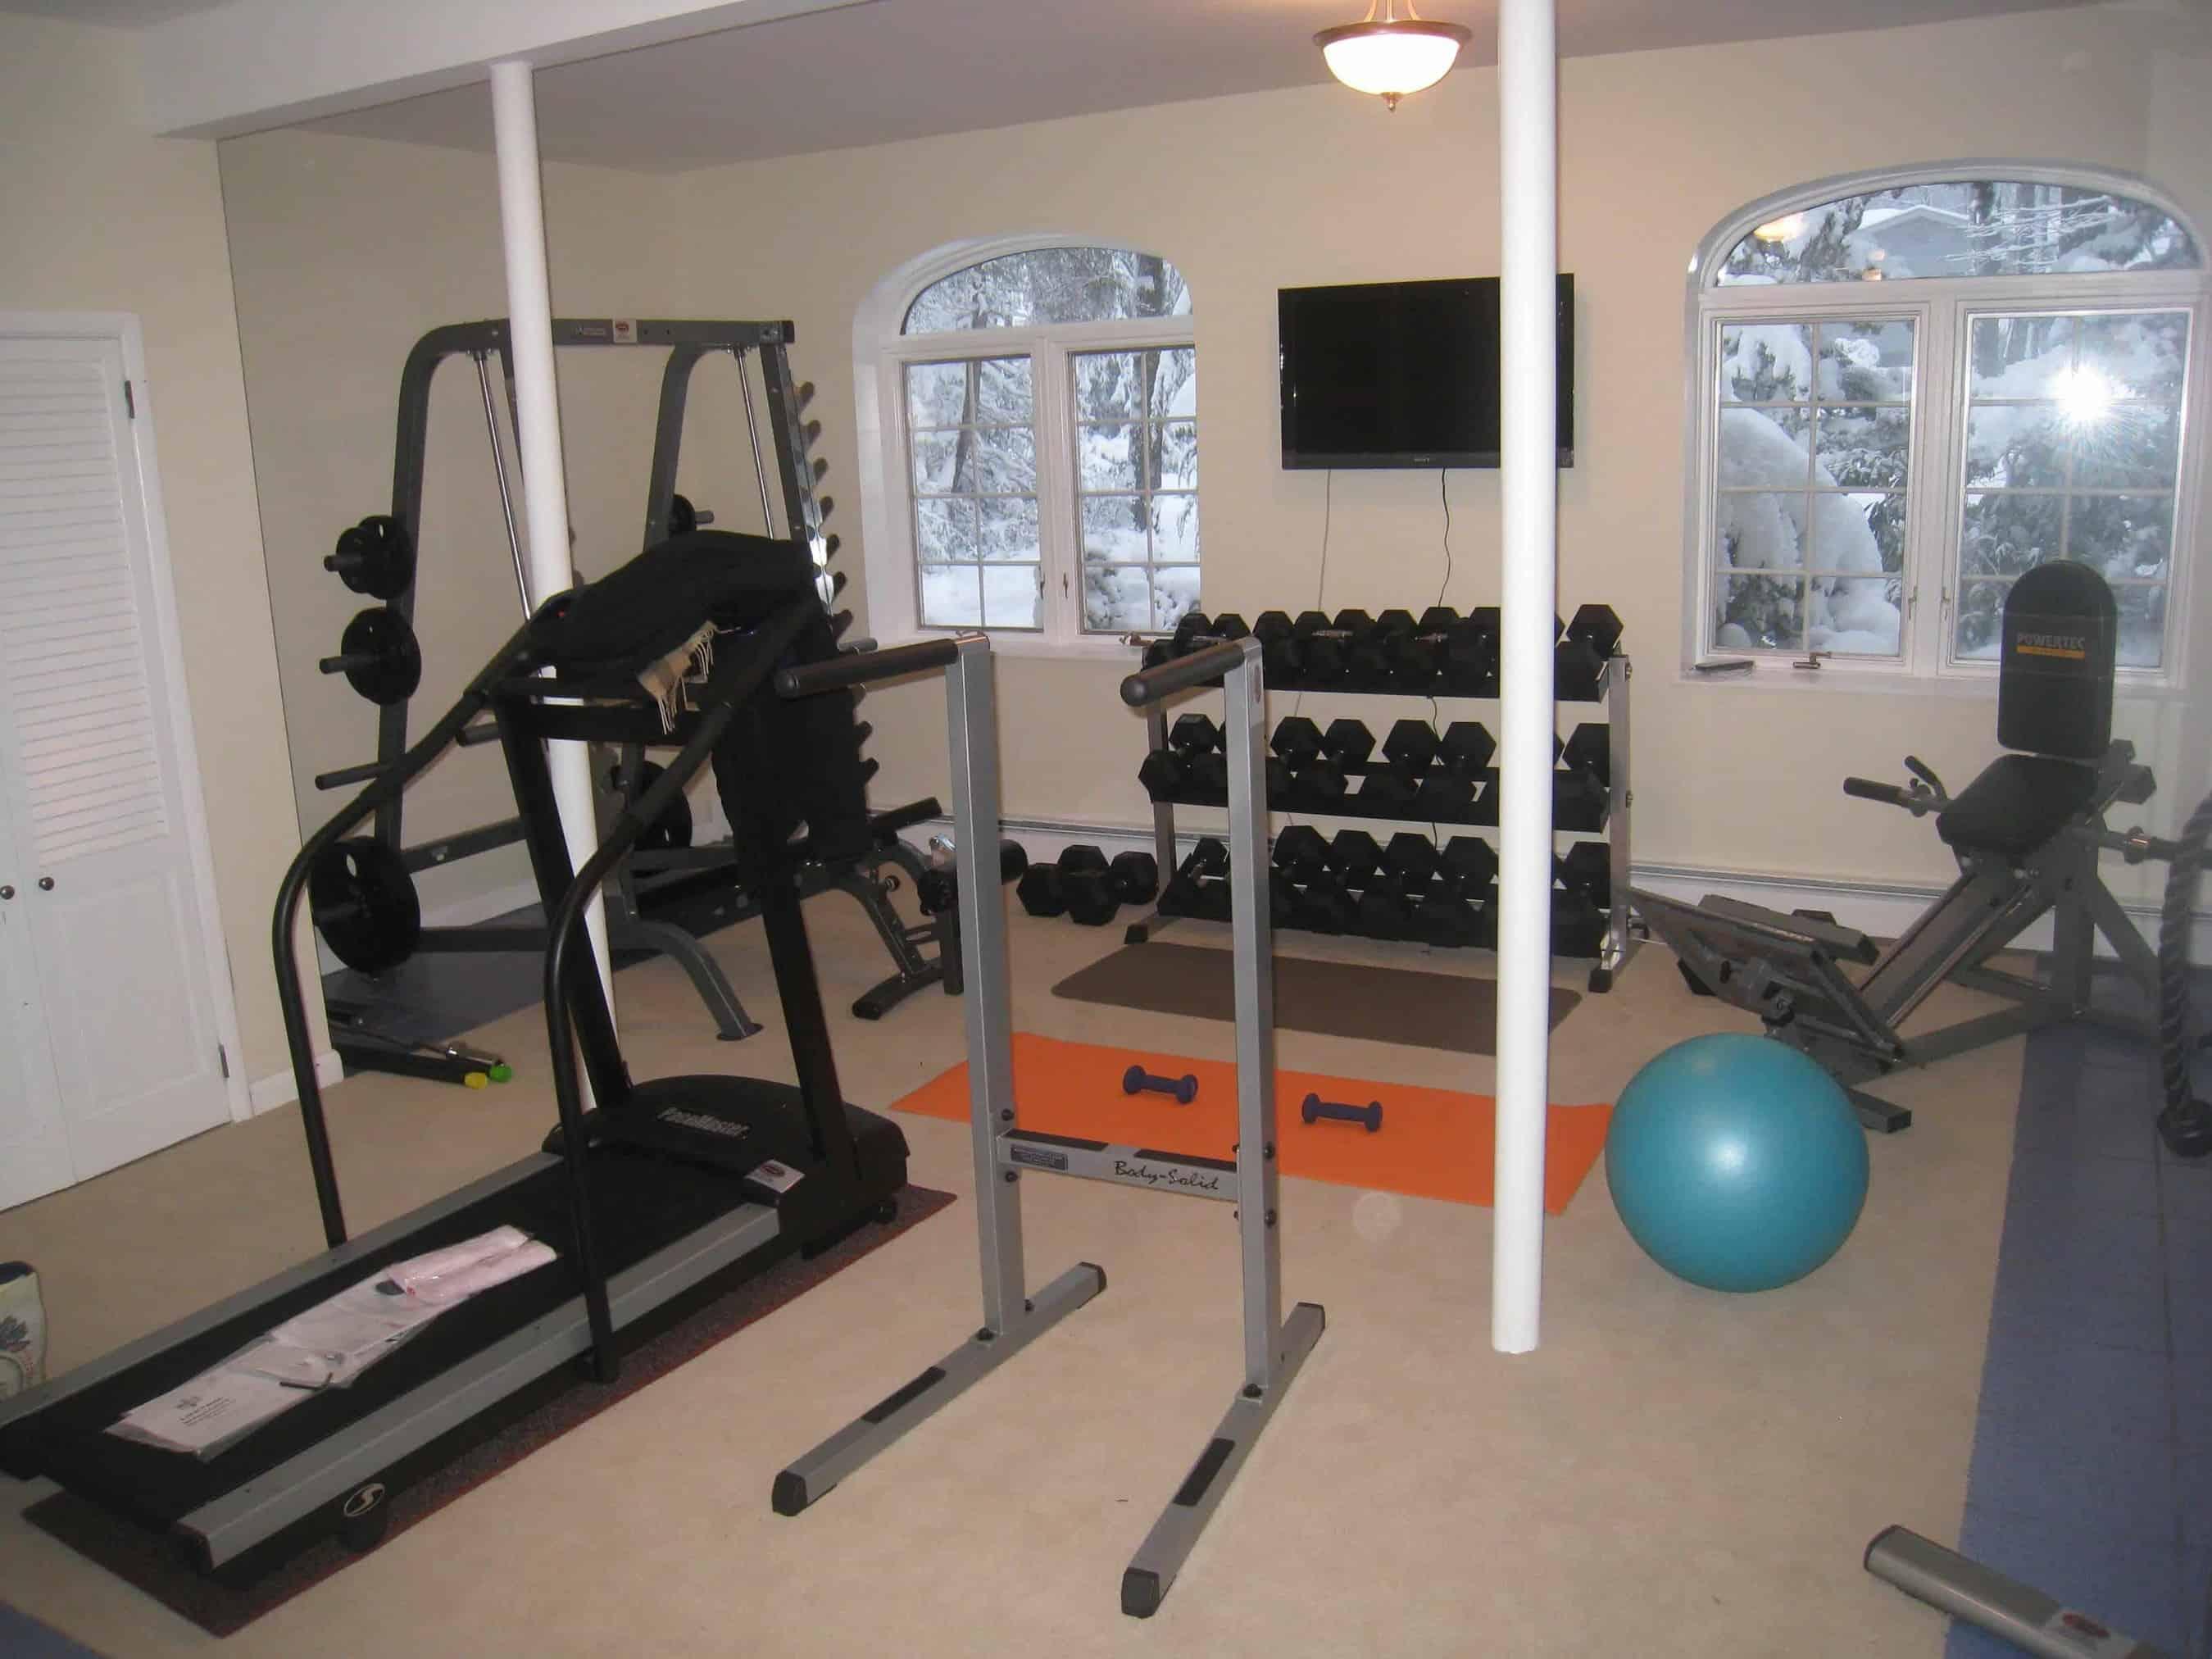 weight bench com bowflex amazon outdoors dp stowable sports